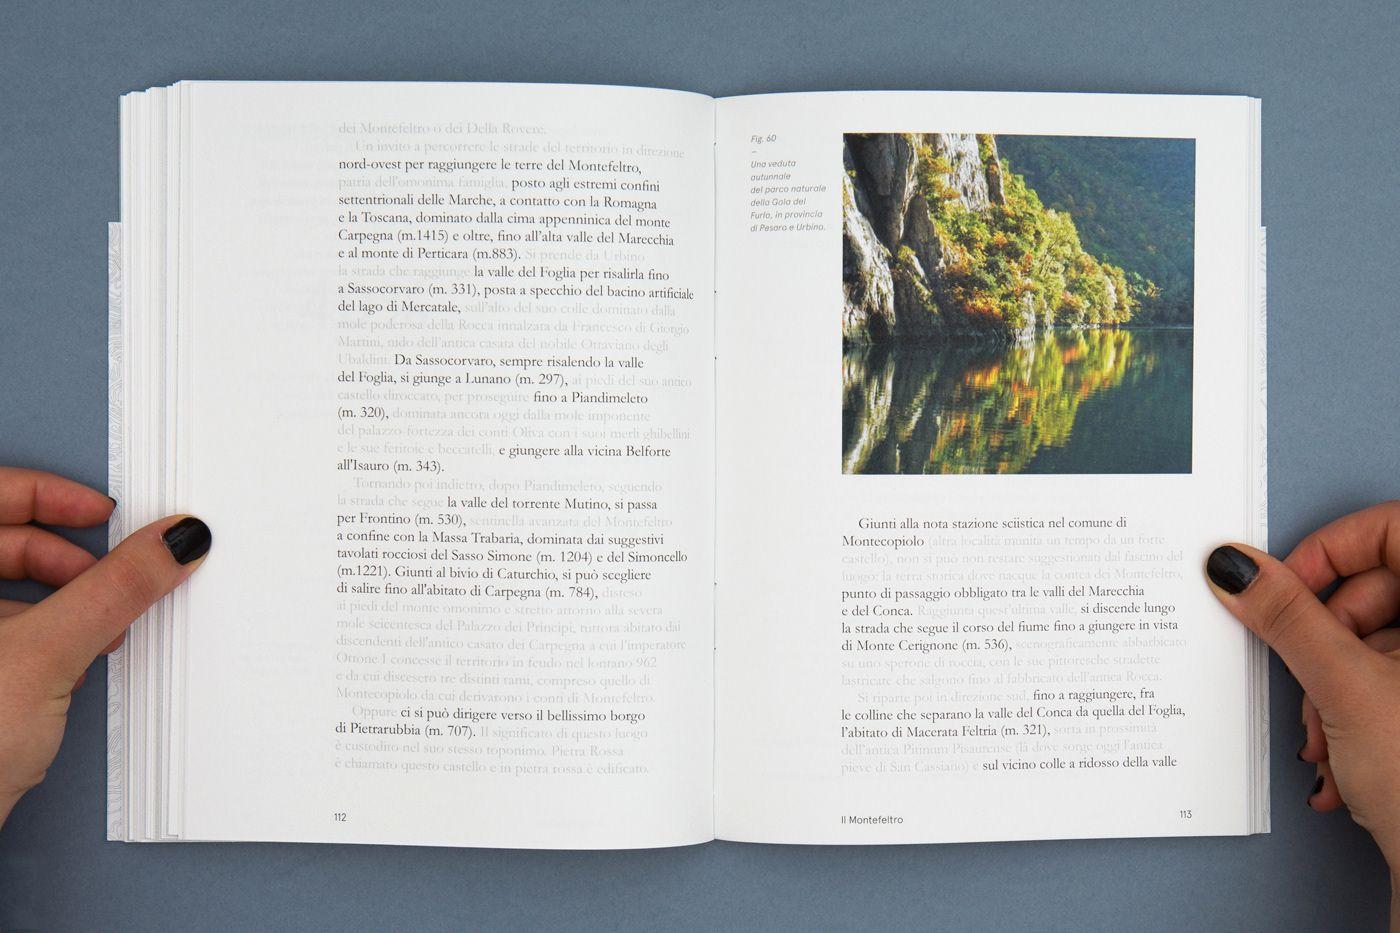 Esiste Il Montefeltro Emotional Atlas On Behance Emotions Atlas Film